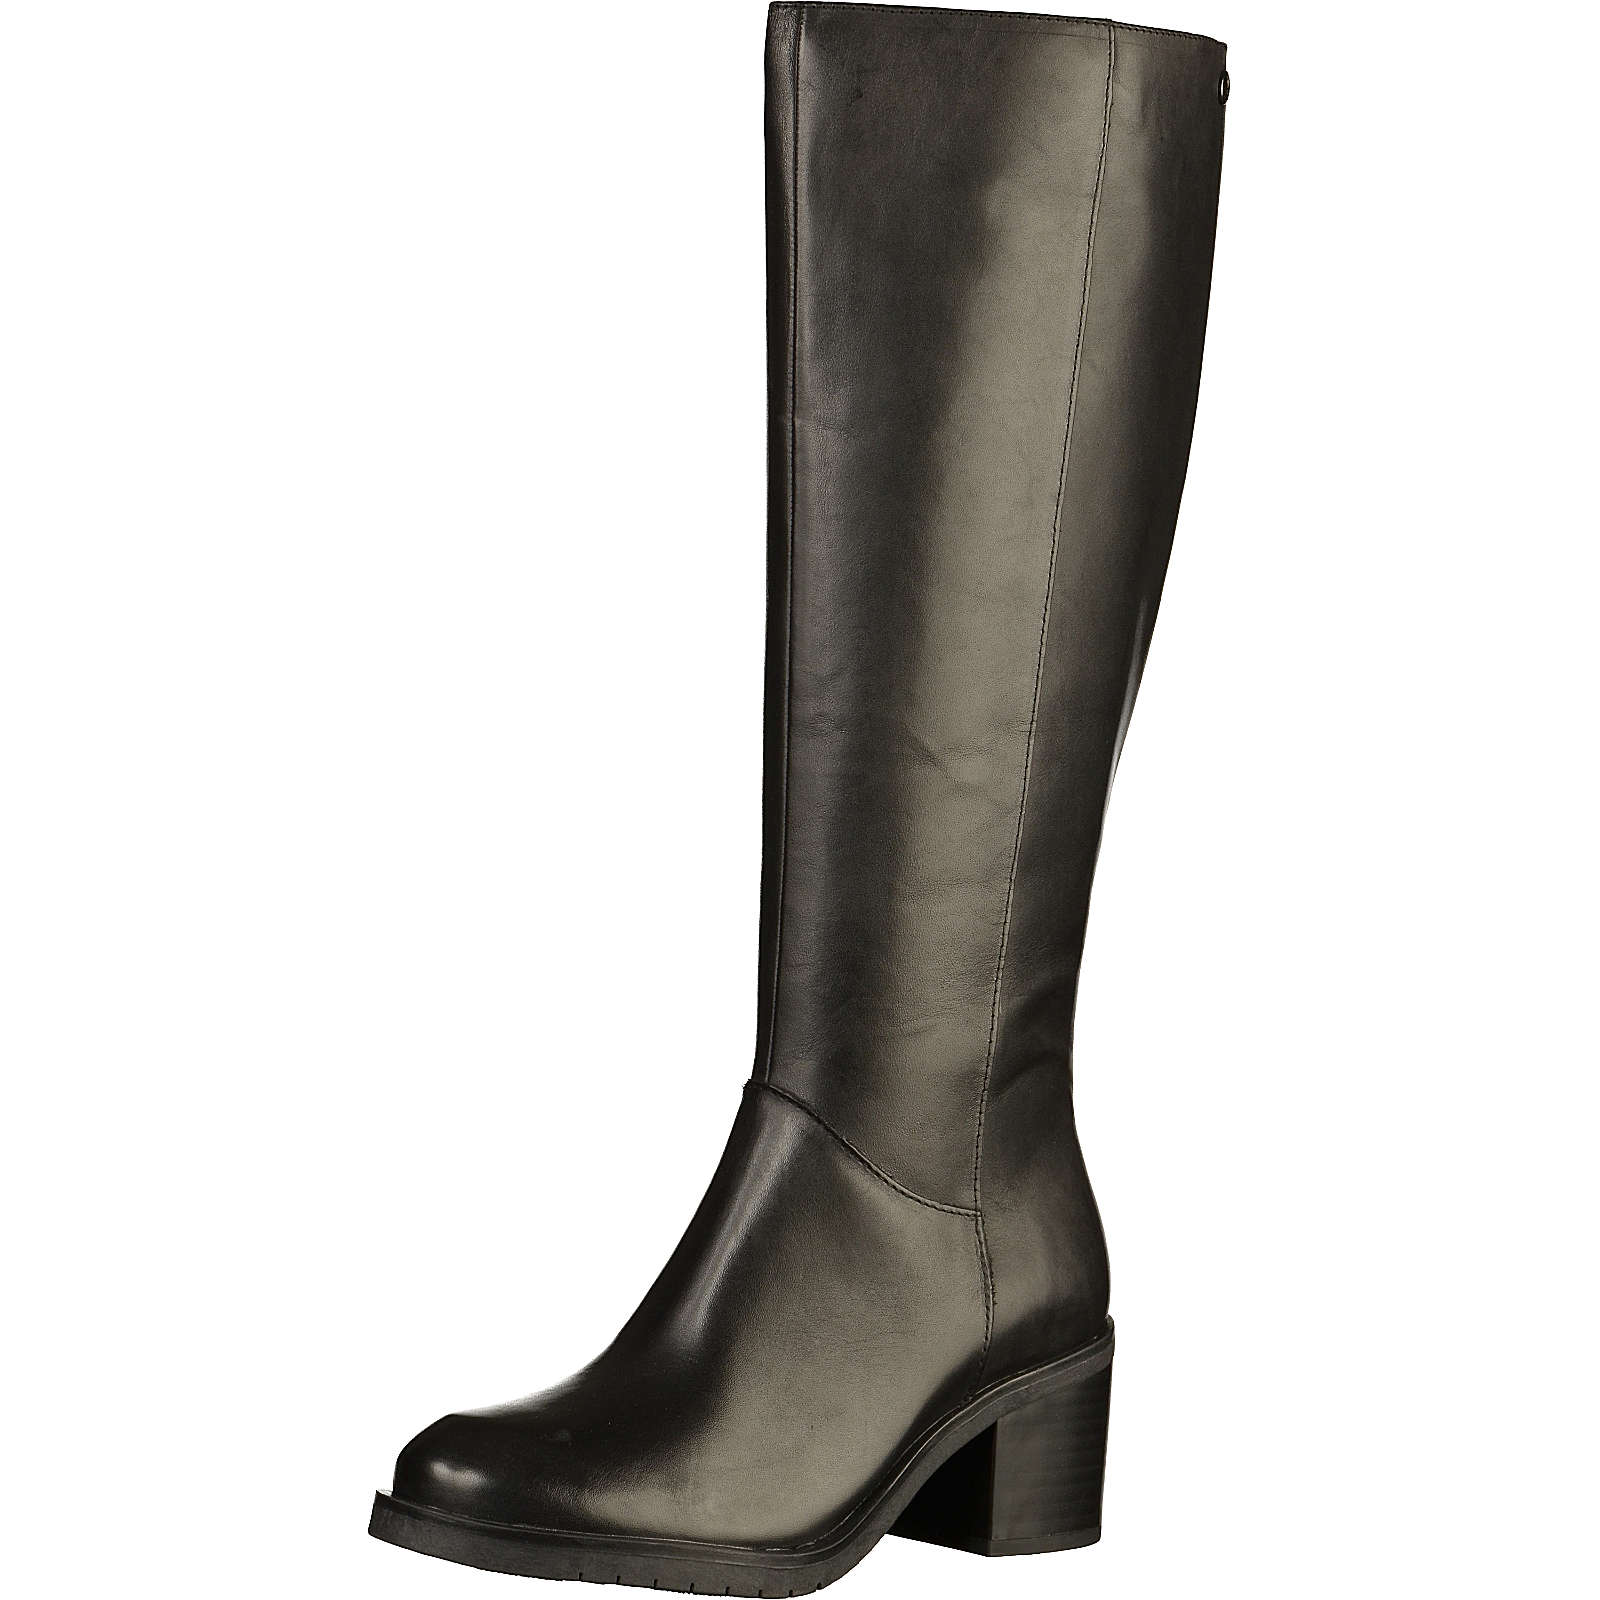 CAPRICE Stiefel Klassische Stiefel schwarz Damen Gr. 39